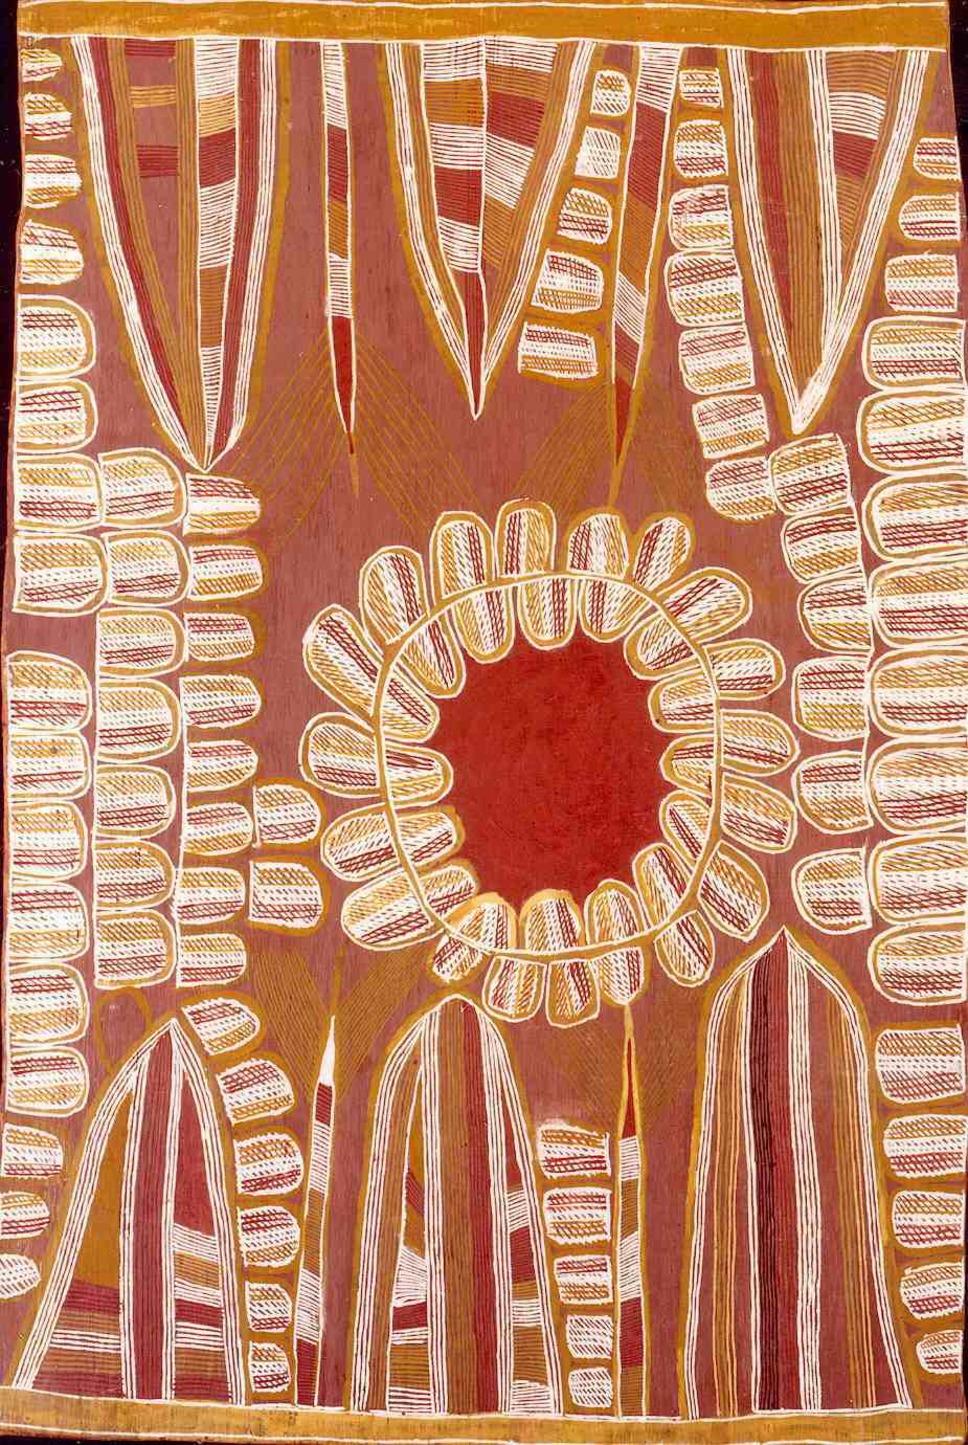 Linda Namiyal Bopirri, 1990, Yolngu Matha (Durrurna clan, Dhuwa moiety), Oyster ('Oyster Dreaming', 'Wayanaka') Bank, Ochre on Bark, 64x95cm.    © the artist's estate, licensed by Aboriginal Artists Agency Ltd; Burkhardt-Felder Collection, Switzerland.